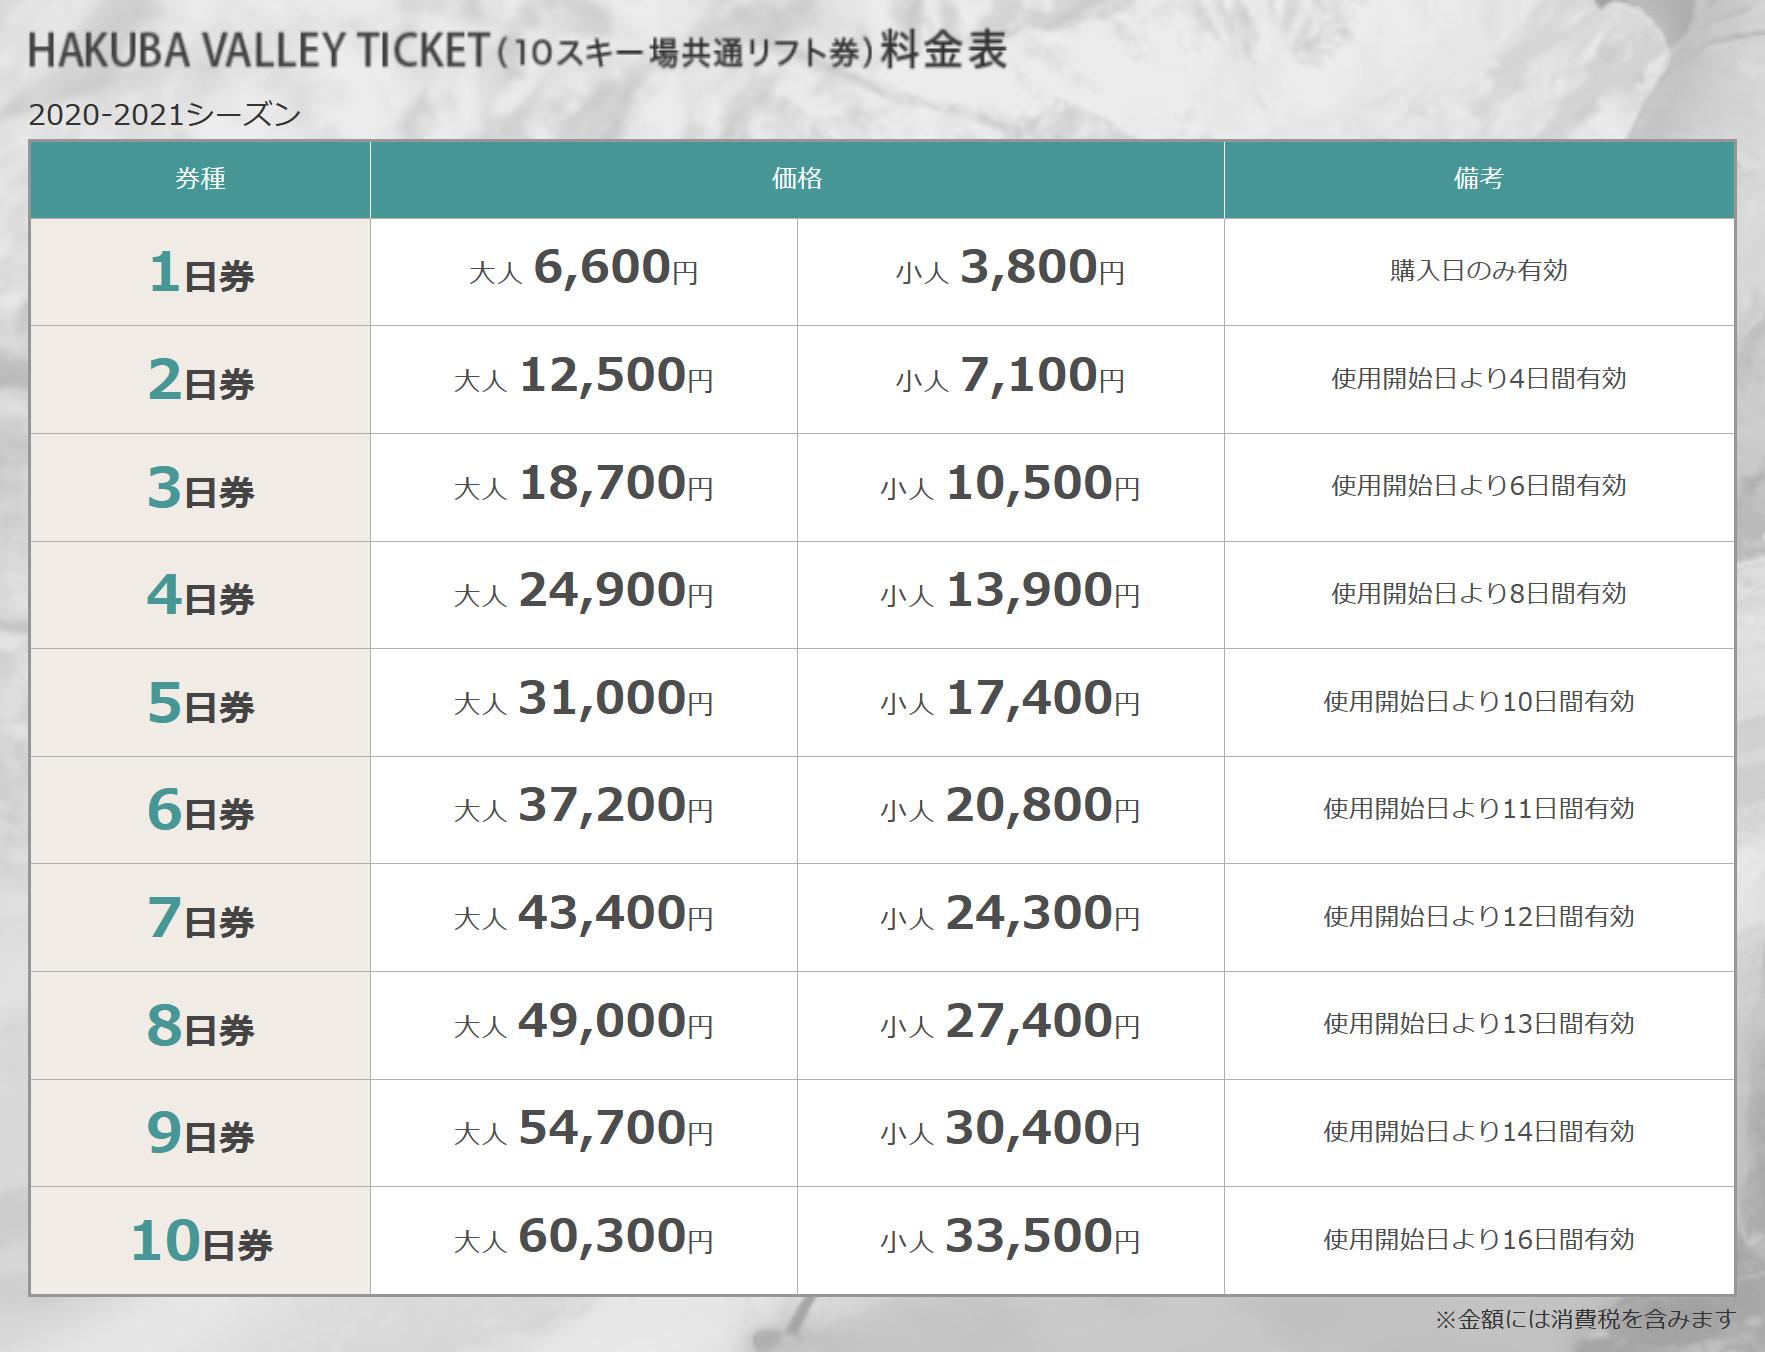 HAKUBA VALLEY TICKET リフト料金表